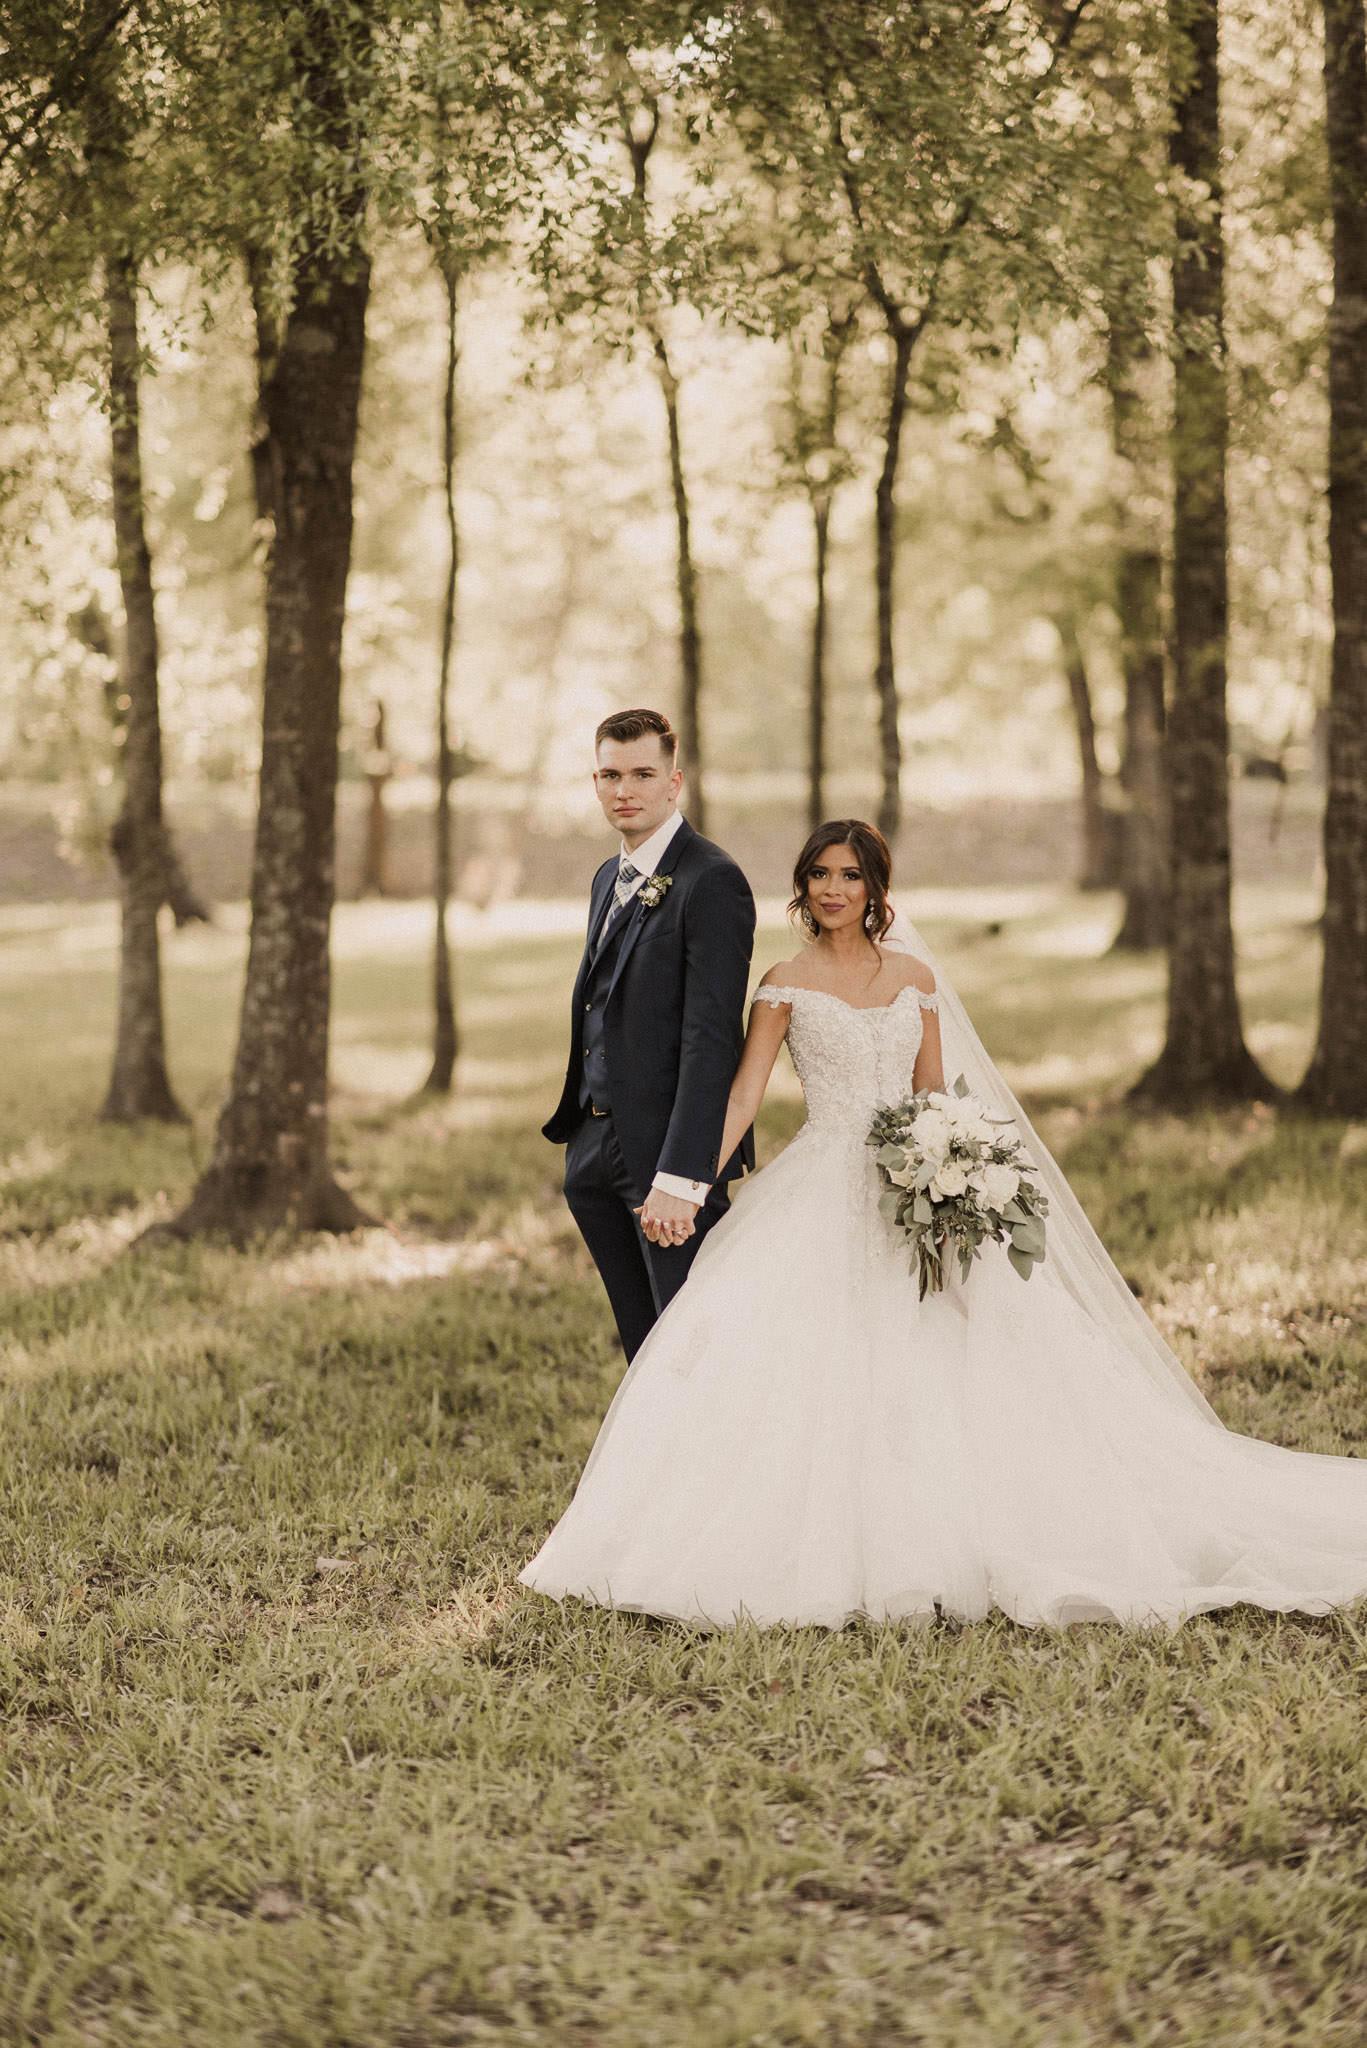 adriana-christian-wedding-re-sm-112.jpg